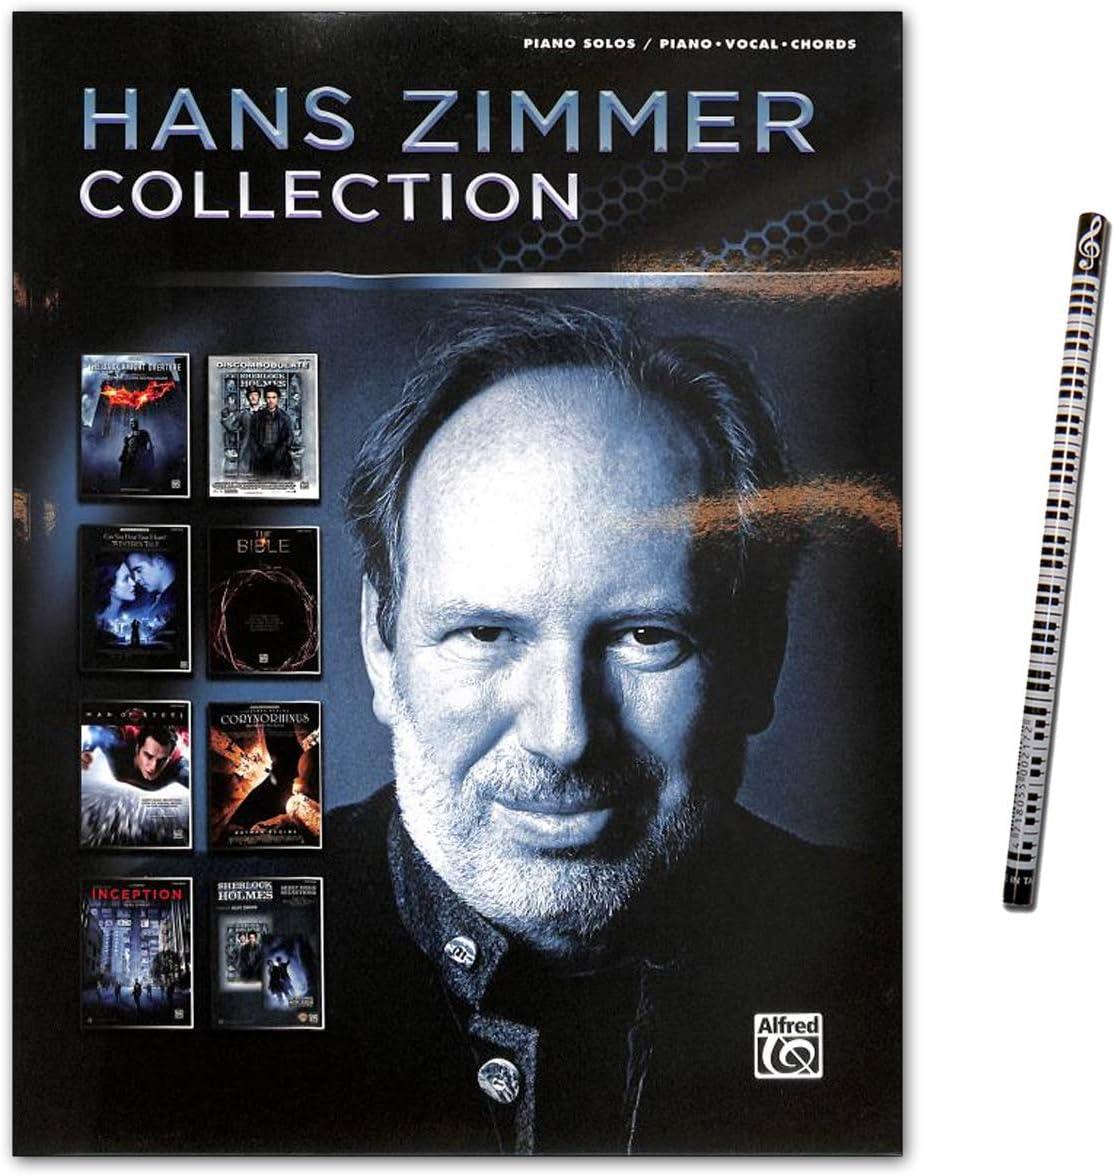 Hans Zimmer Collection Piano Solos 9781470615277 - Libro de ...